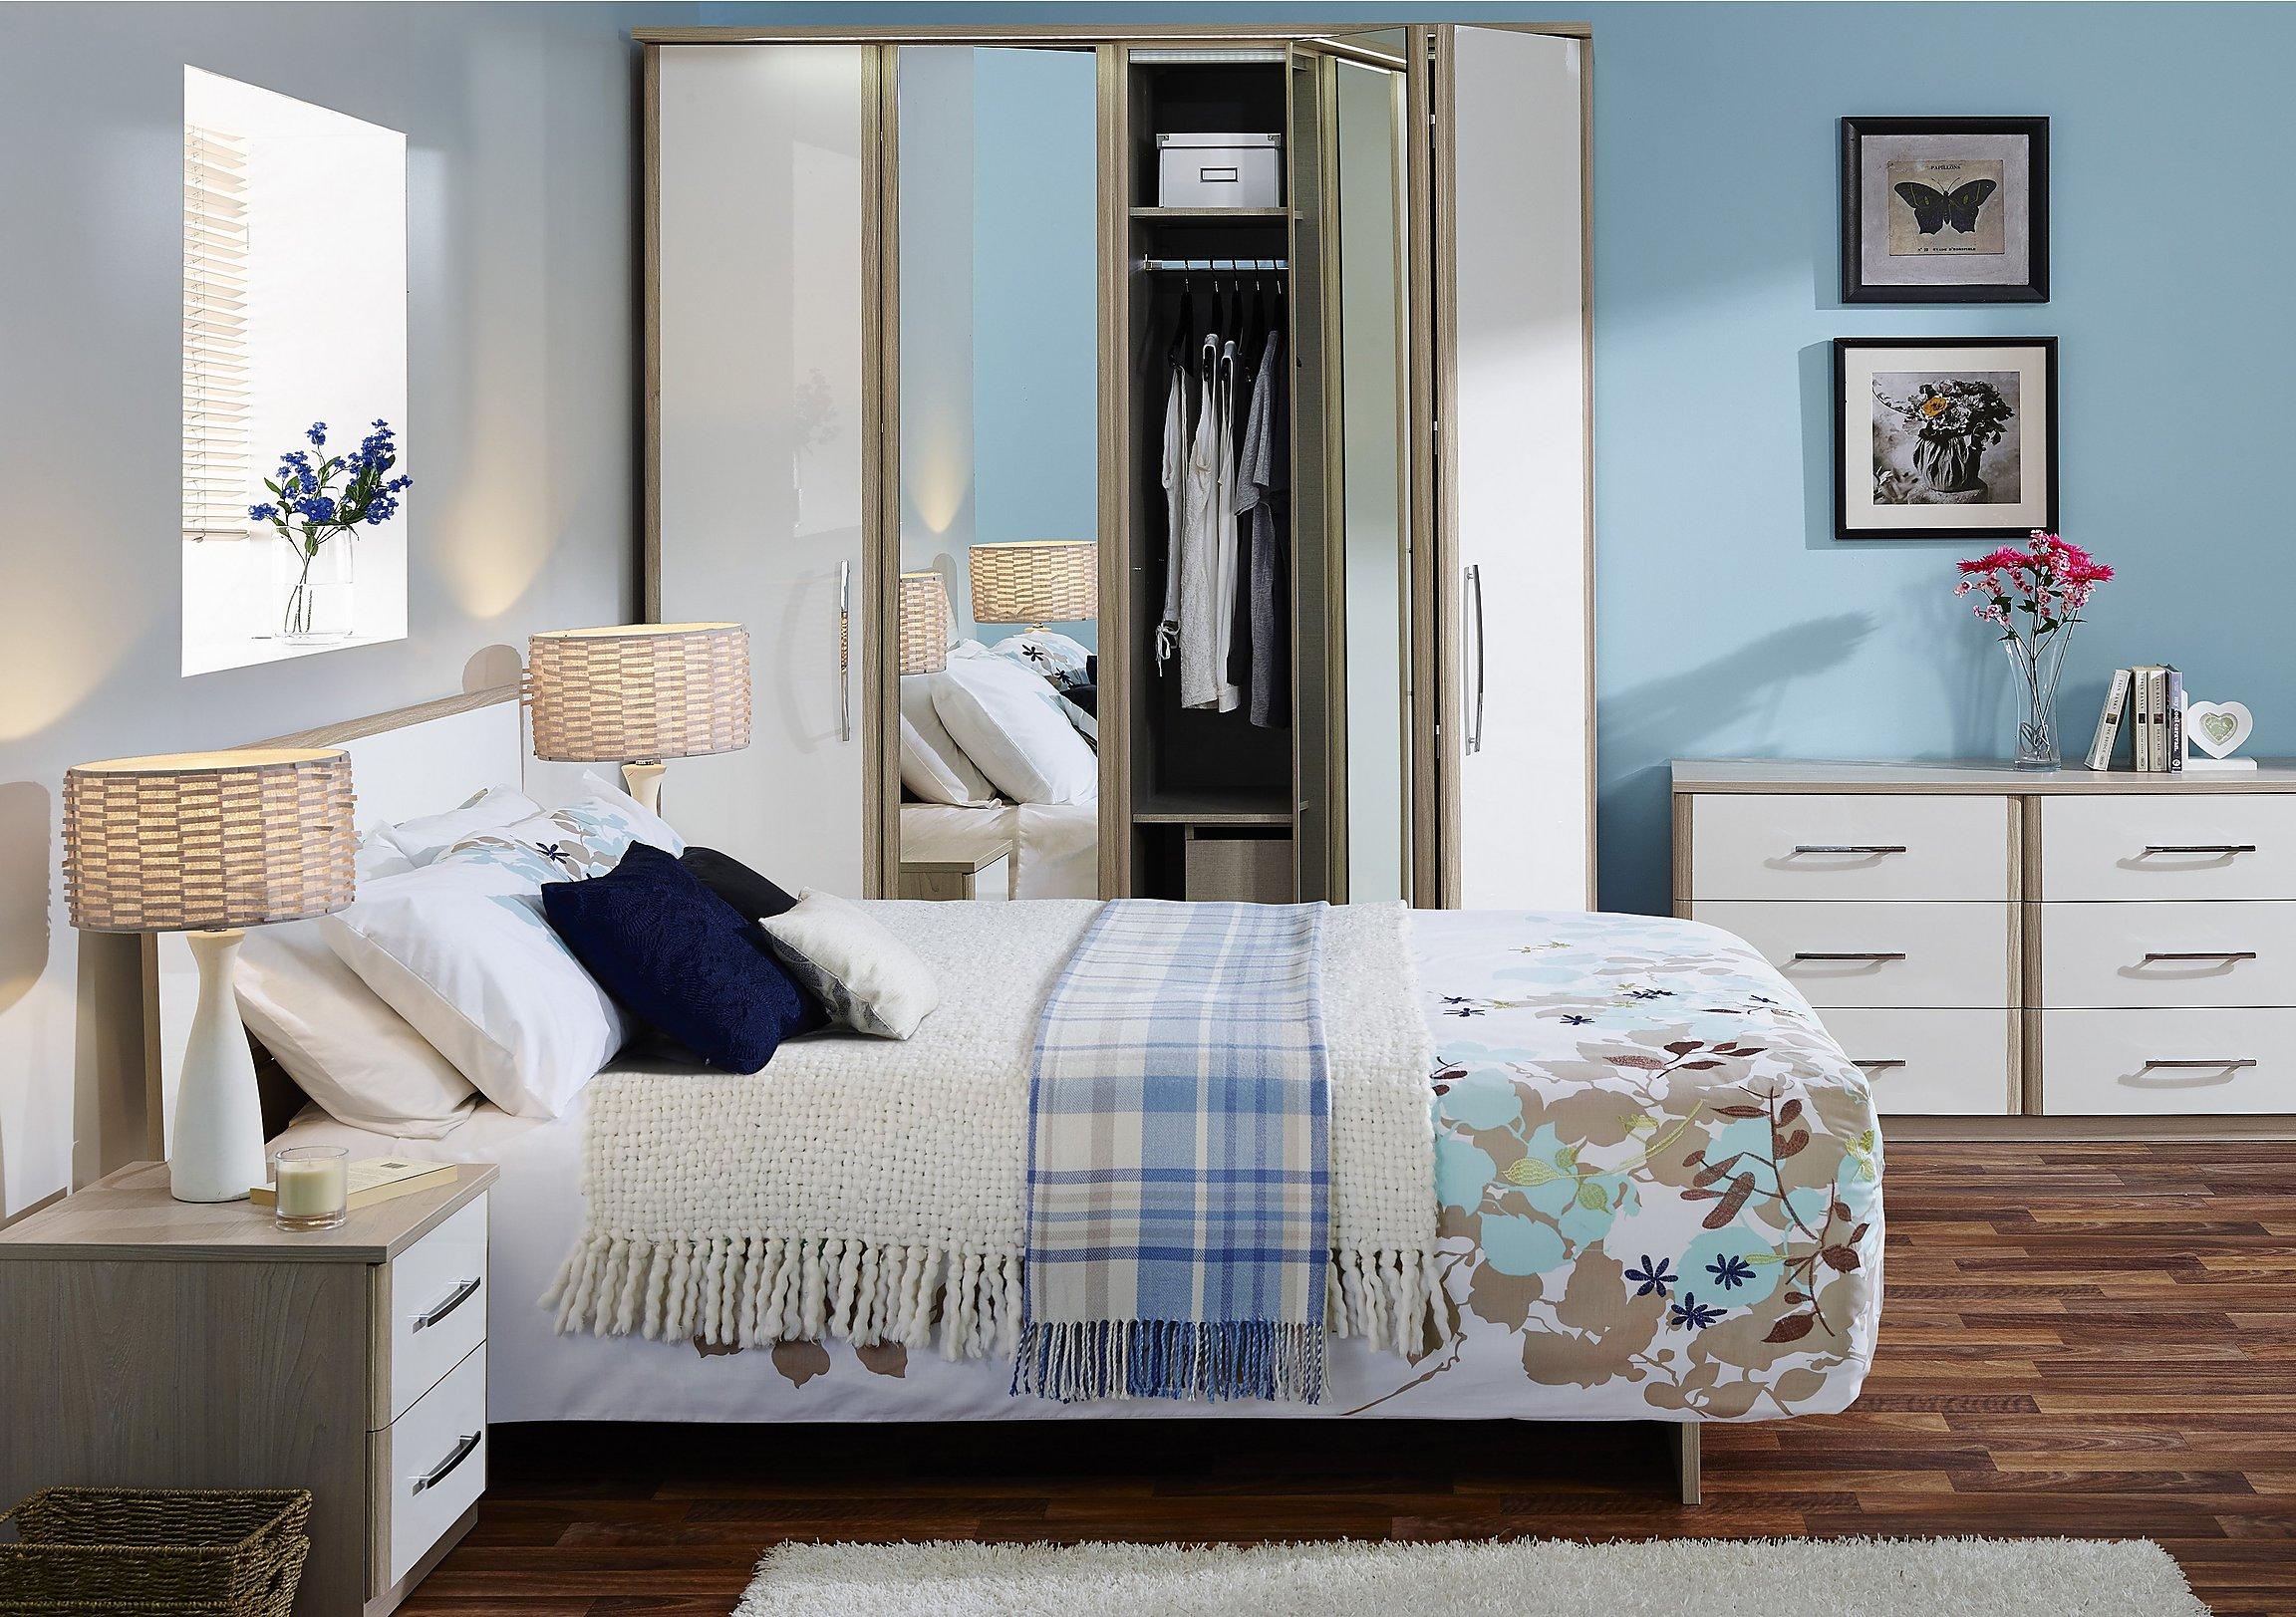 Lifestyle Bedroom Furniture Kingsley Bedroom Mirror Furniture Village